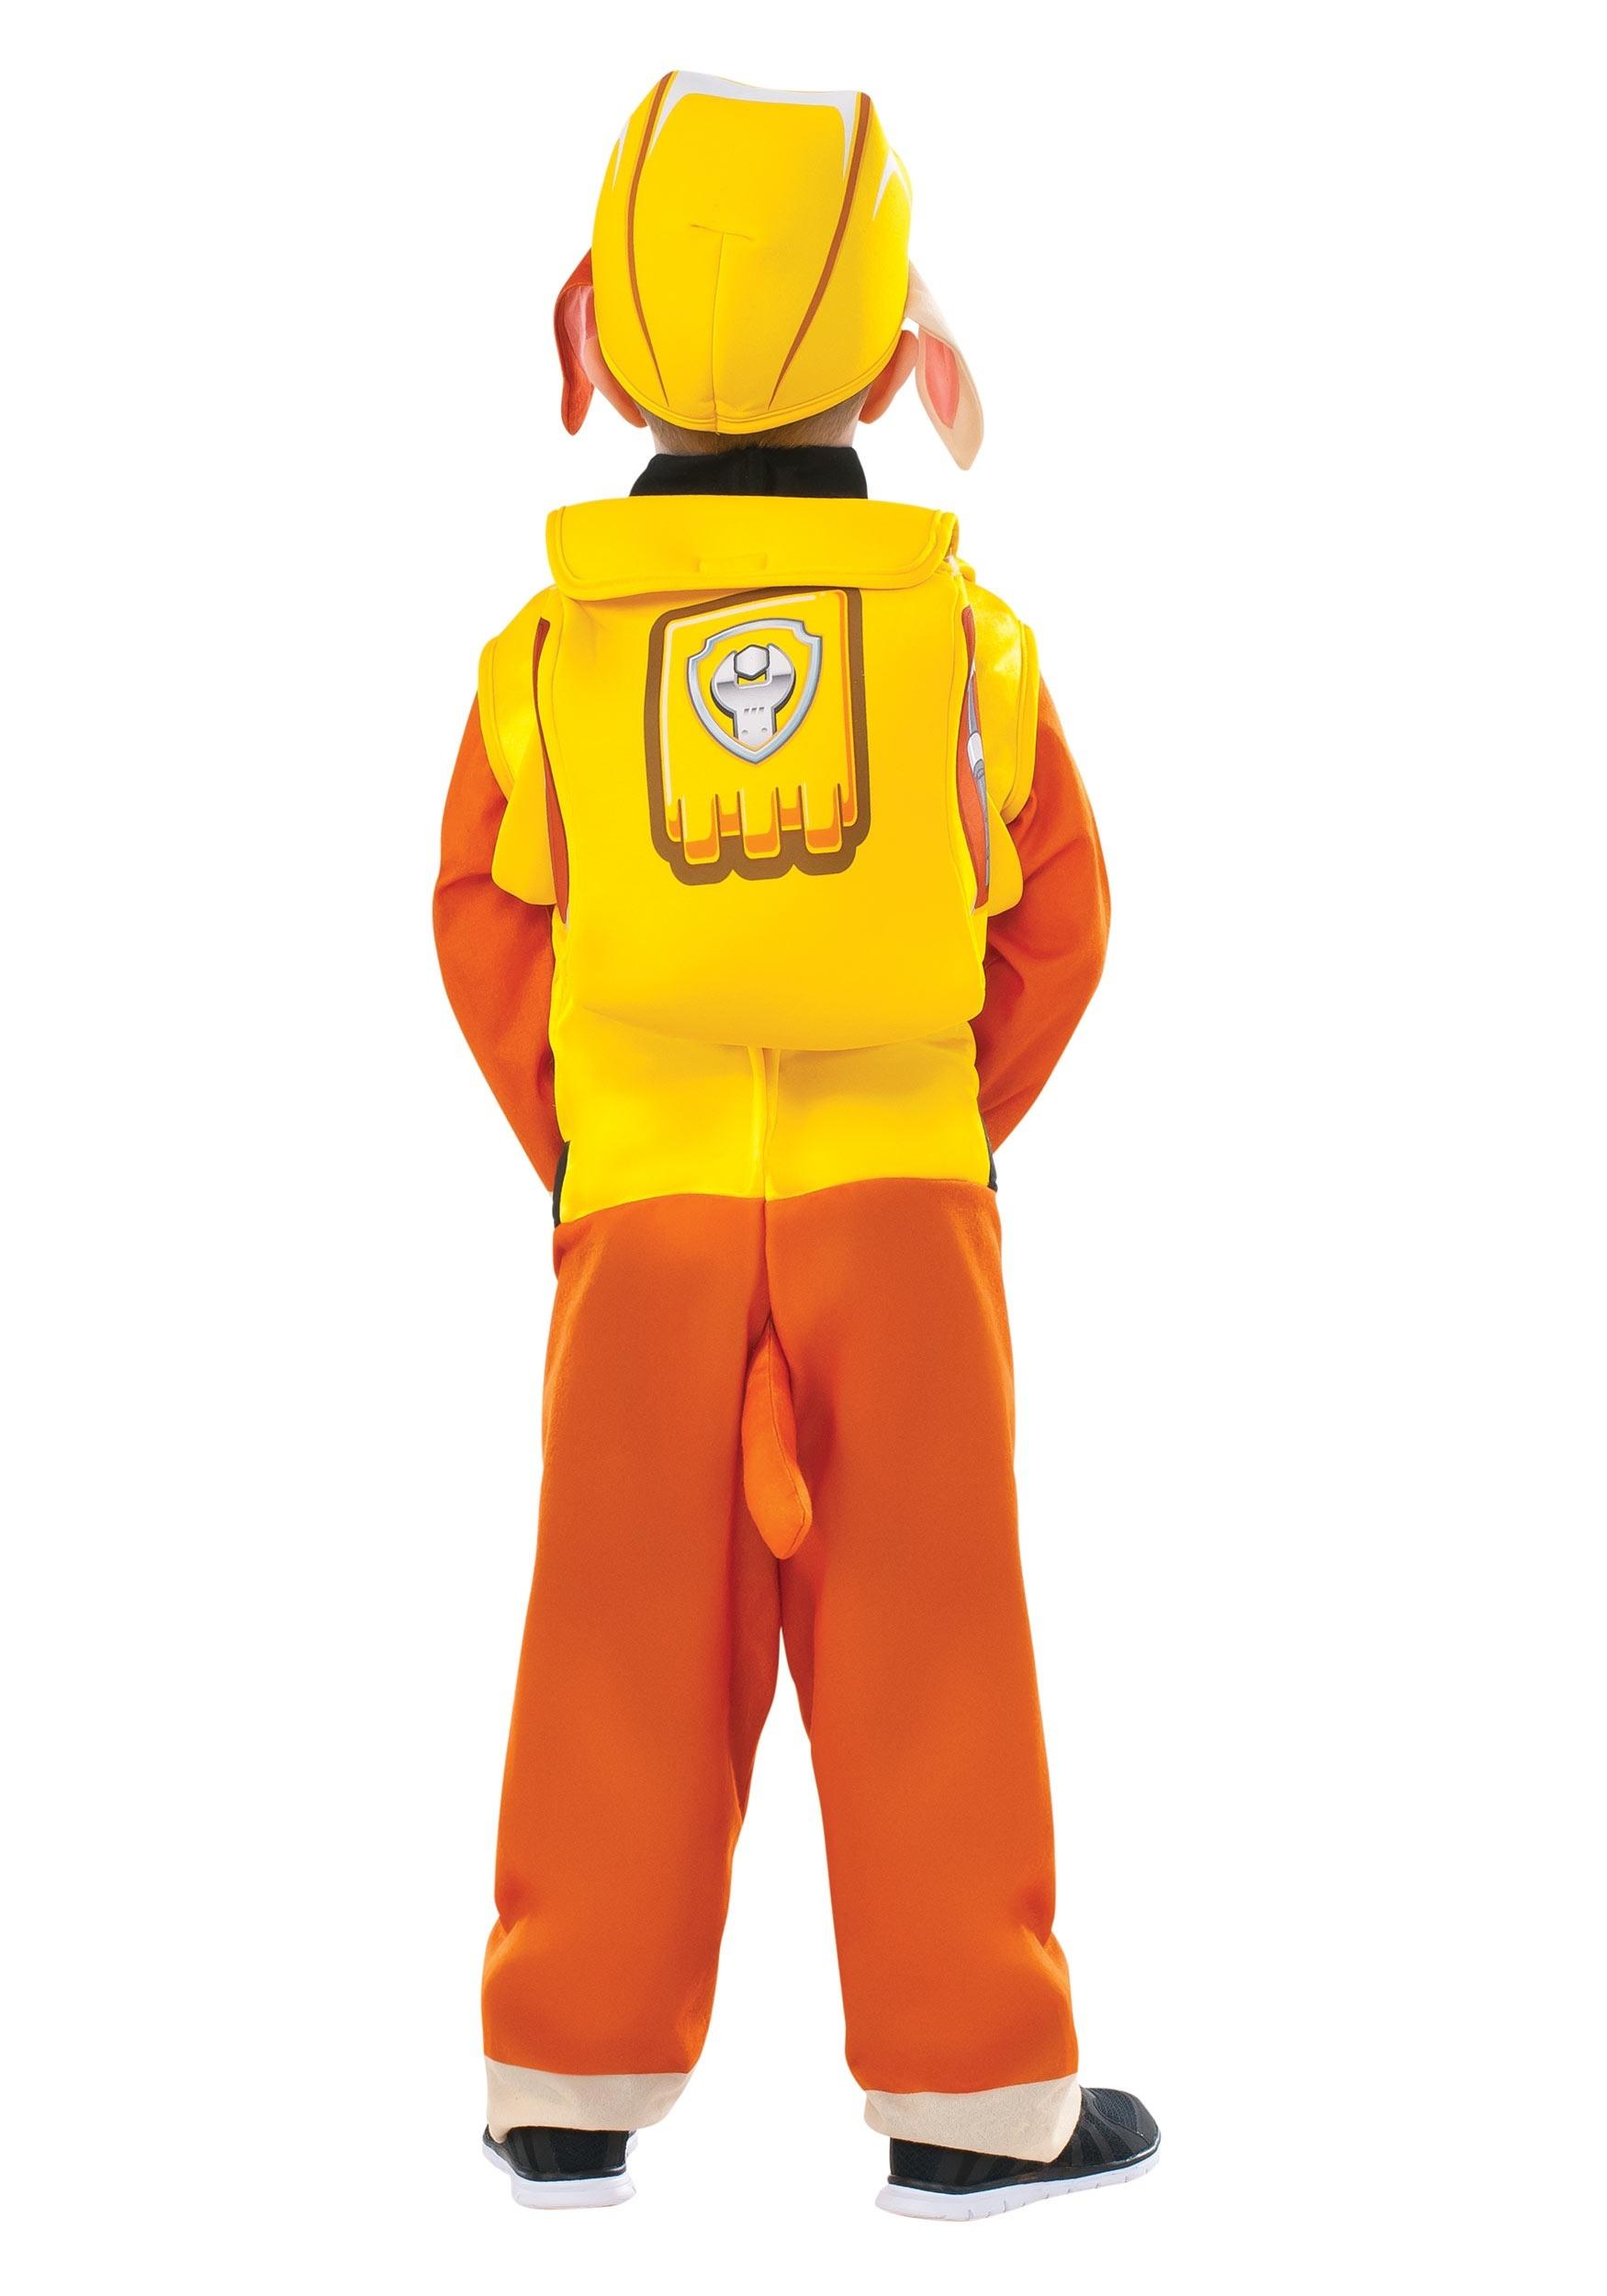 8a8c8301e Paw Patrol Rubble Costume